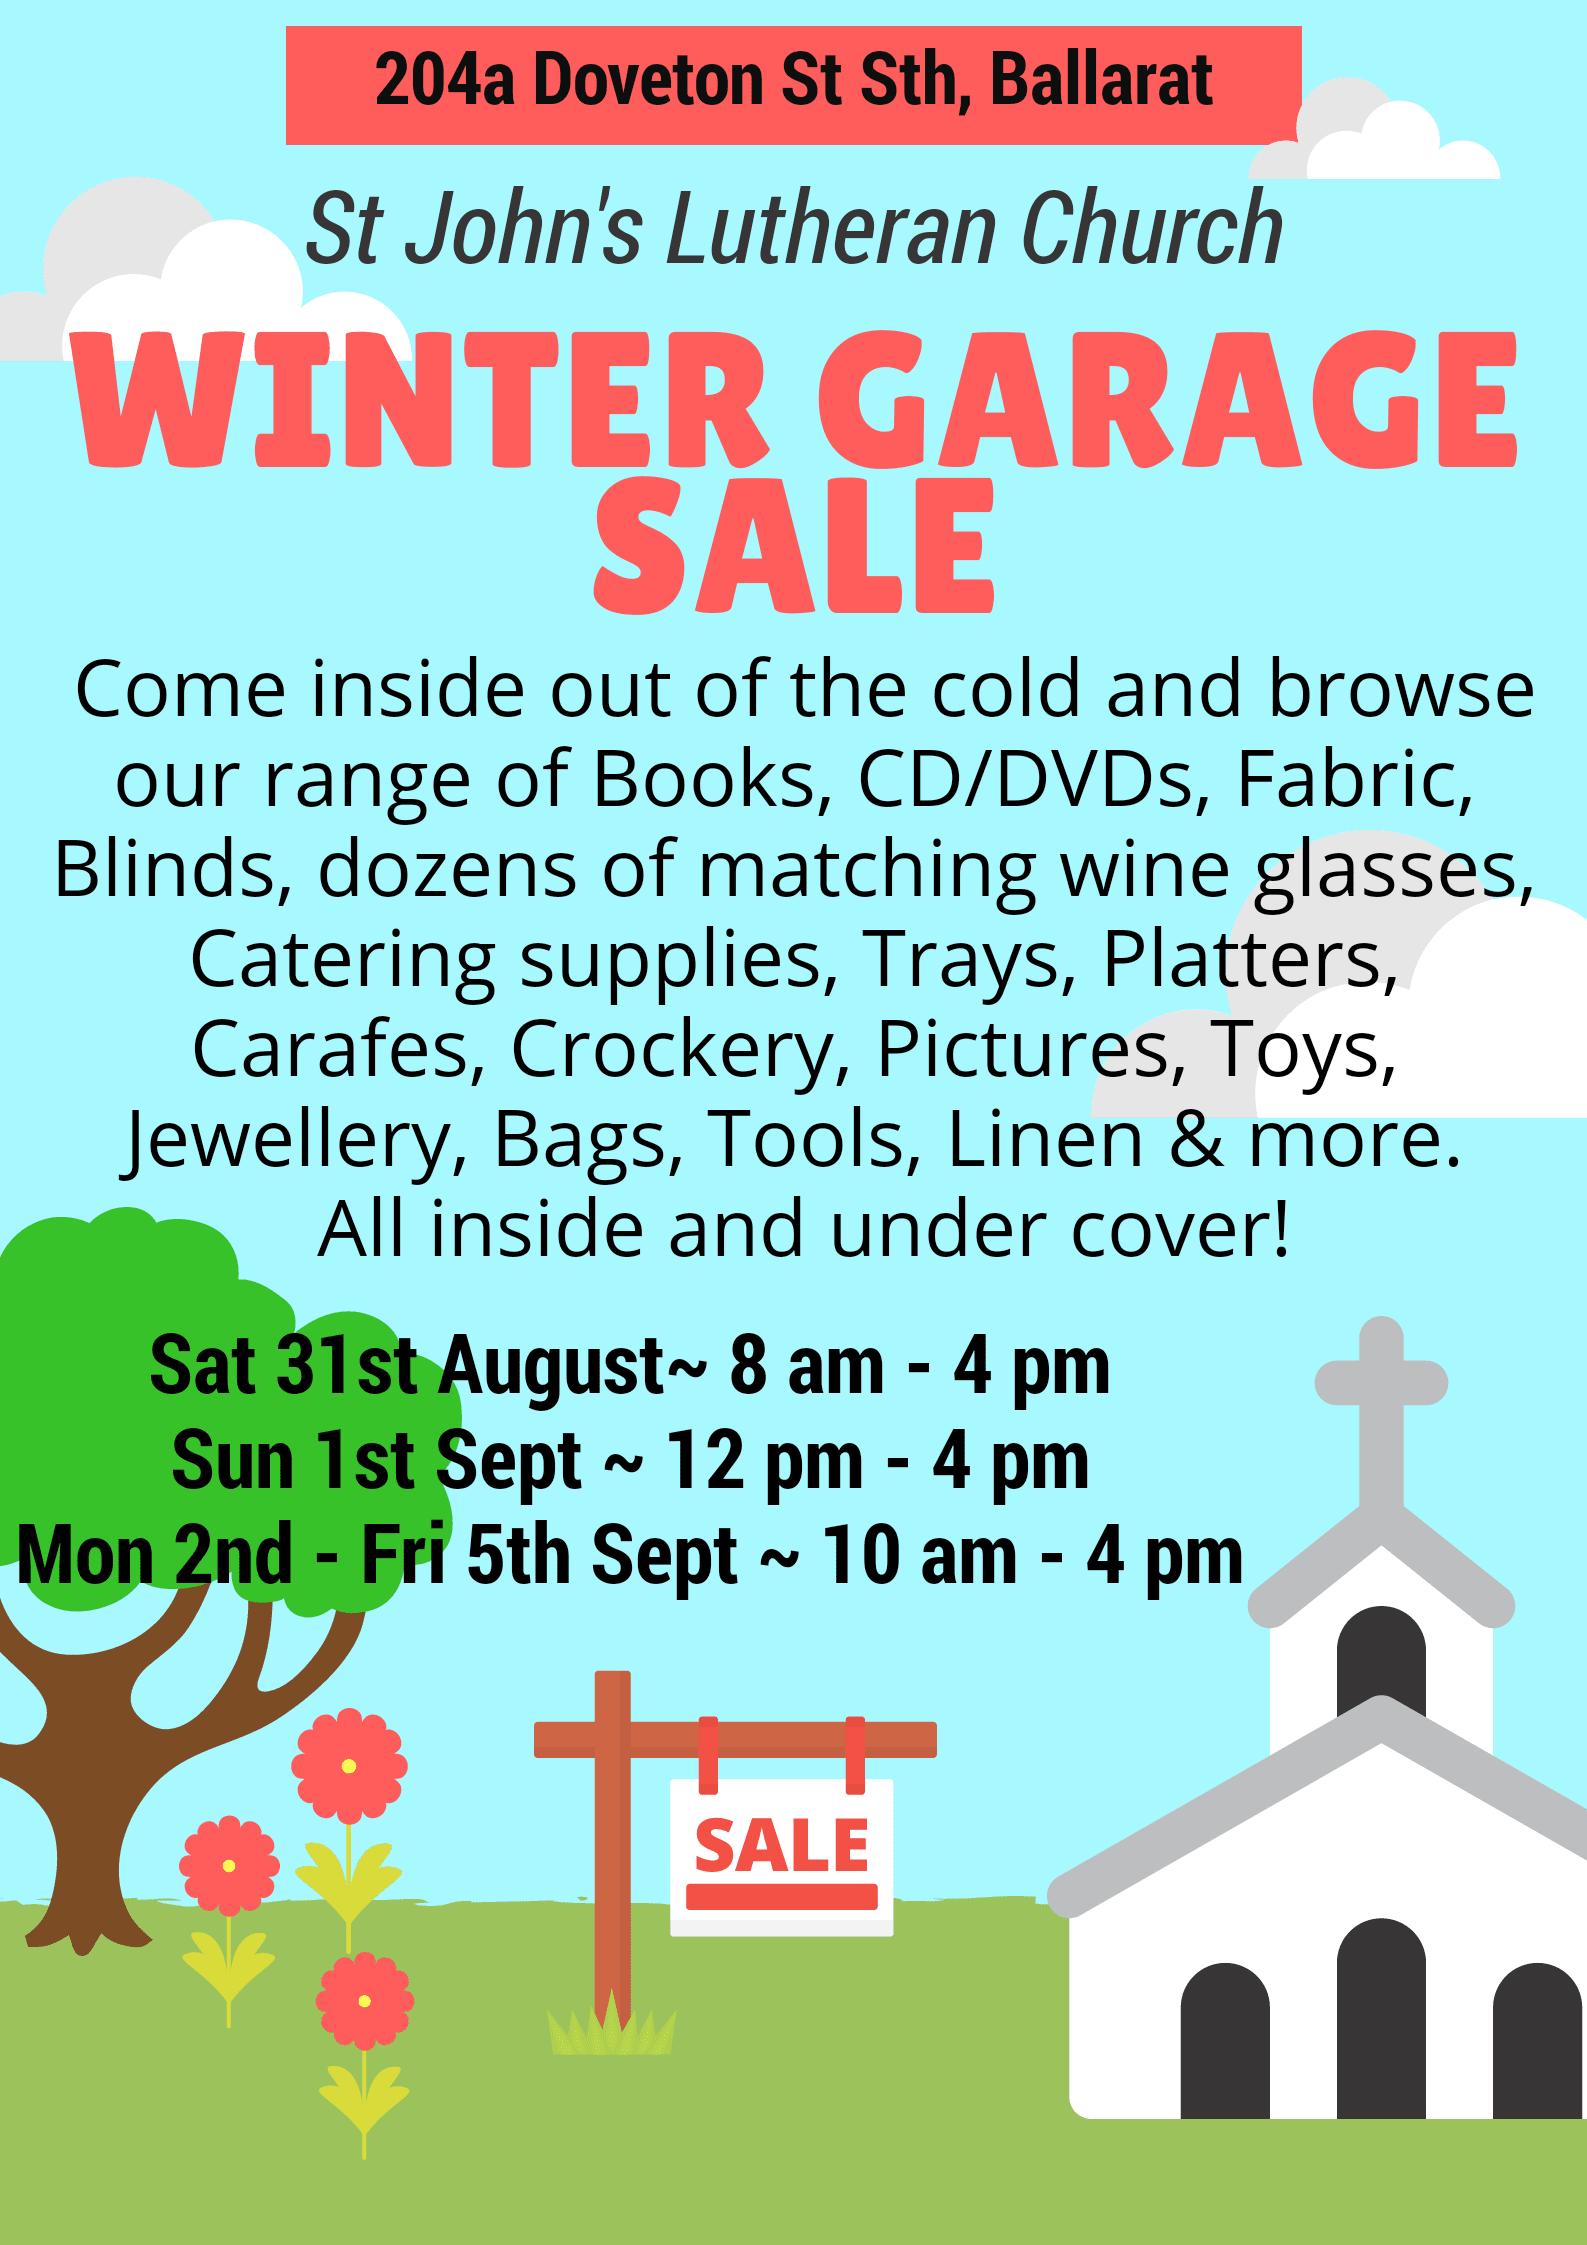 St John's Lutheran Church Winter Garage Sale - What's On